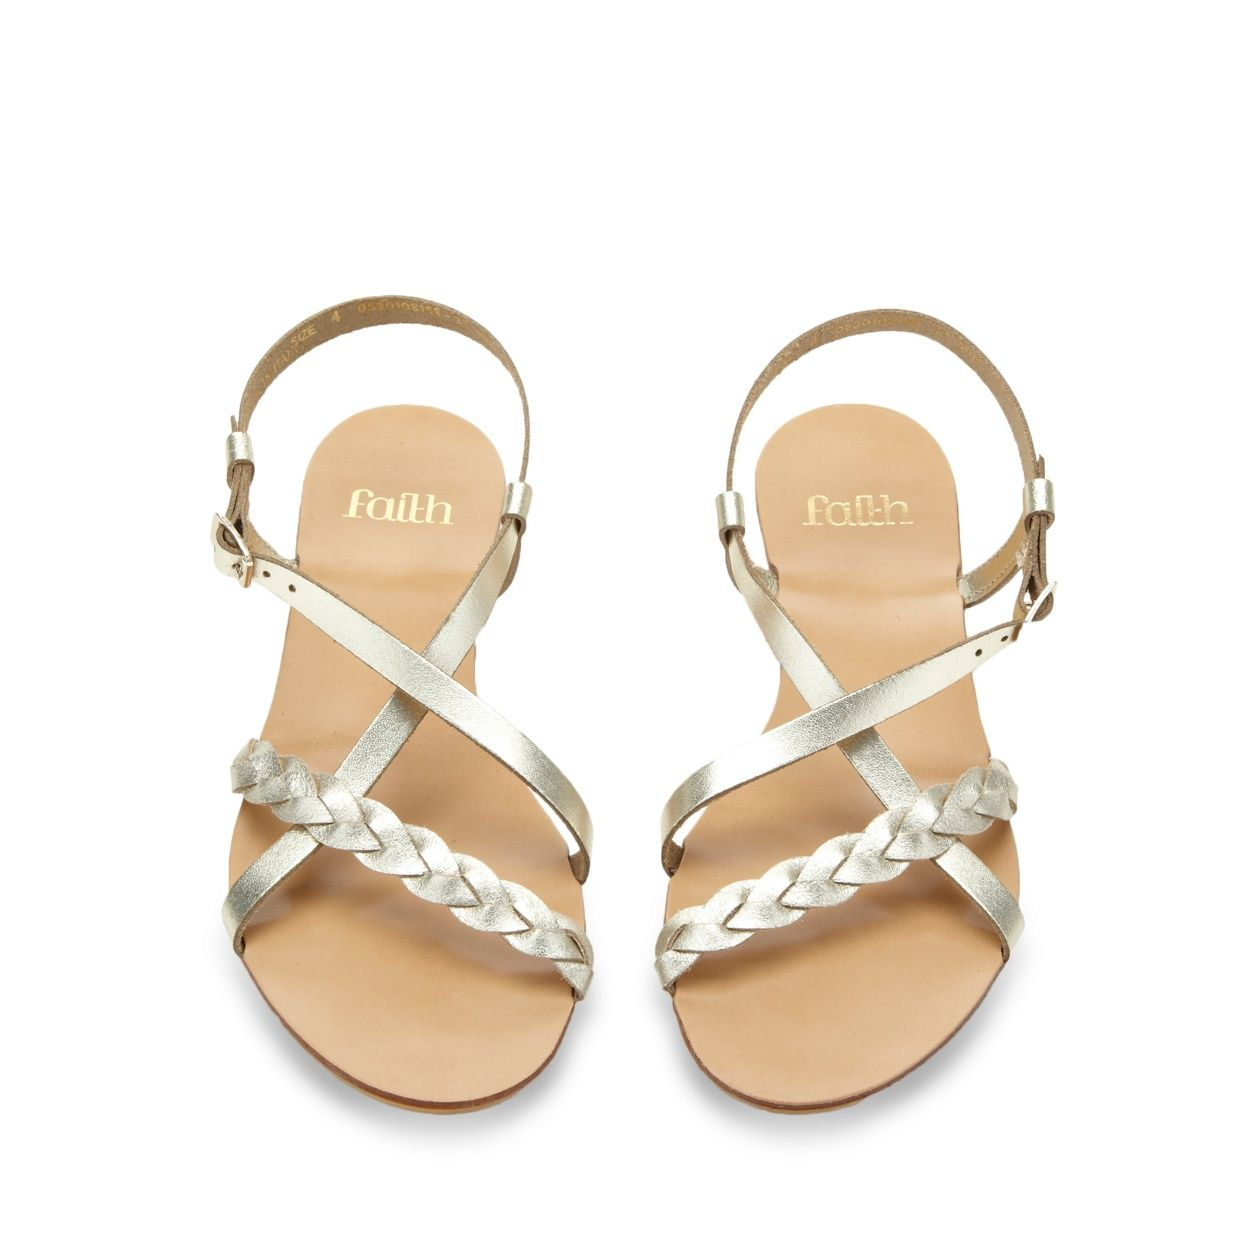 Women's sandals debenhams - Faith Light Gold Leather Plaited Strap Sandals At Debenhams Com